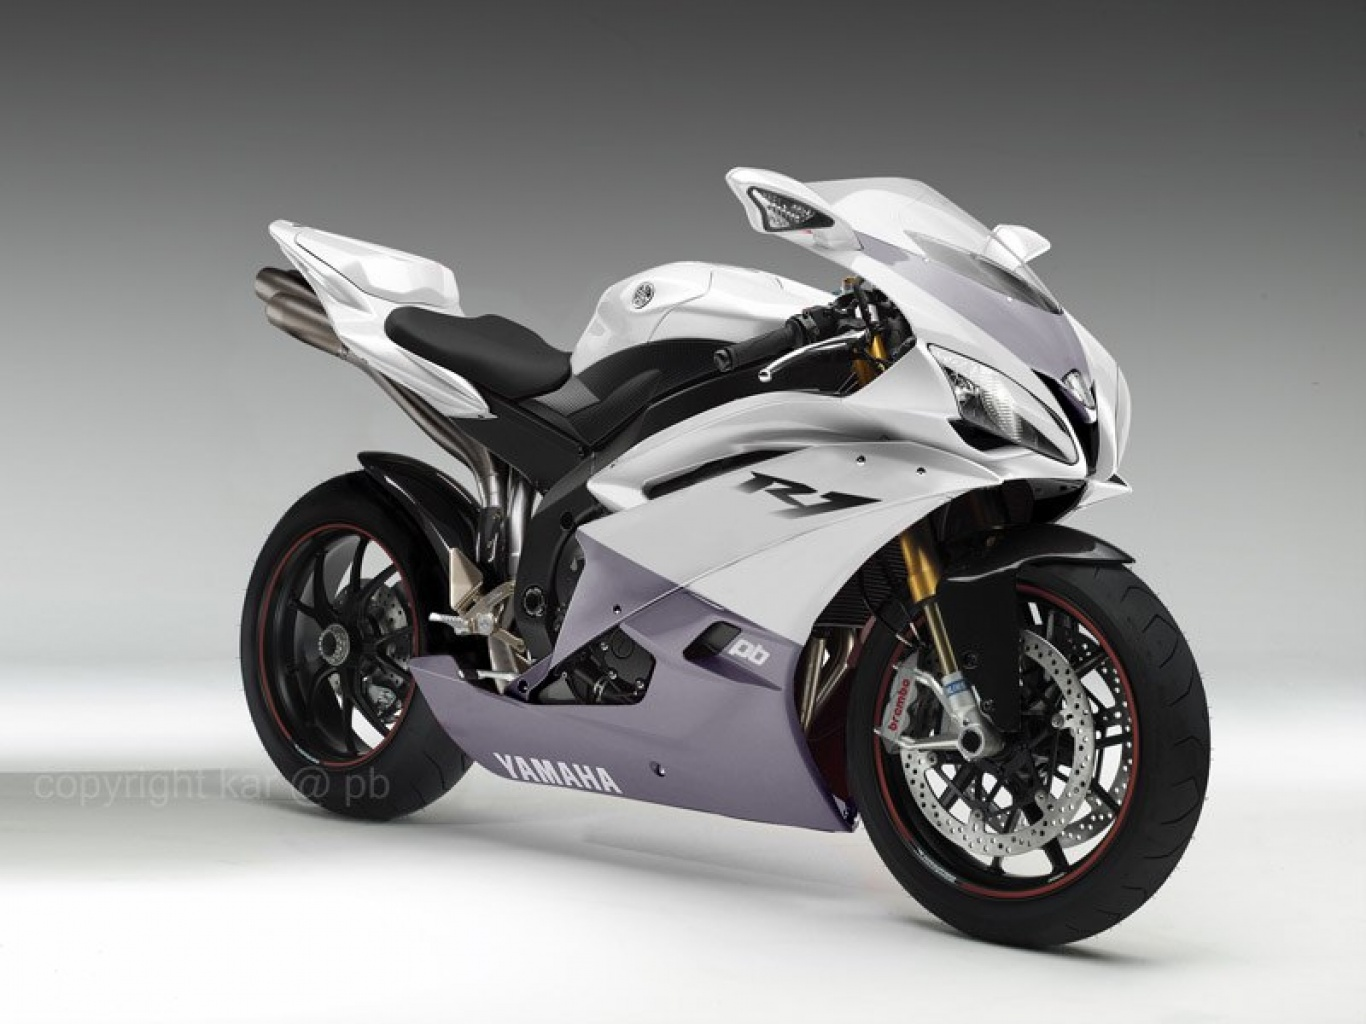 las mejores motos deportivas imagenes chopper taringa. Black Bedroom Furniture Sets. Home Design Ideas